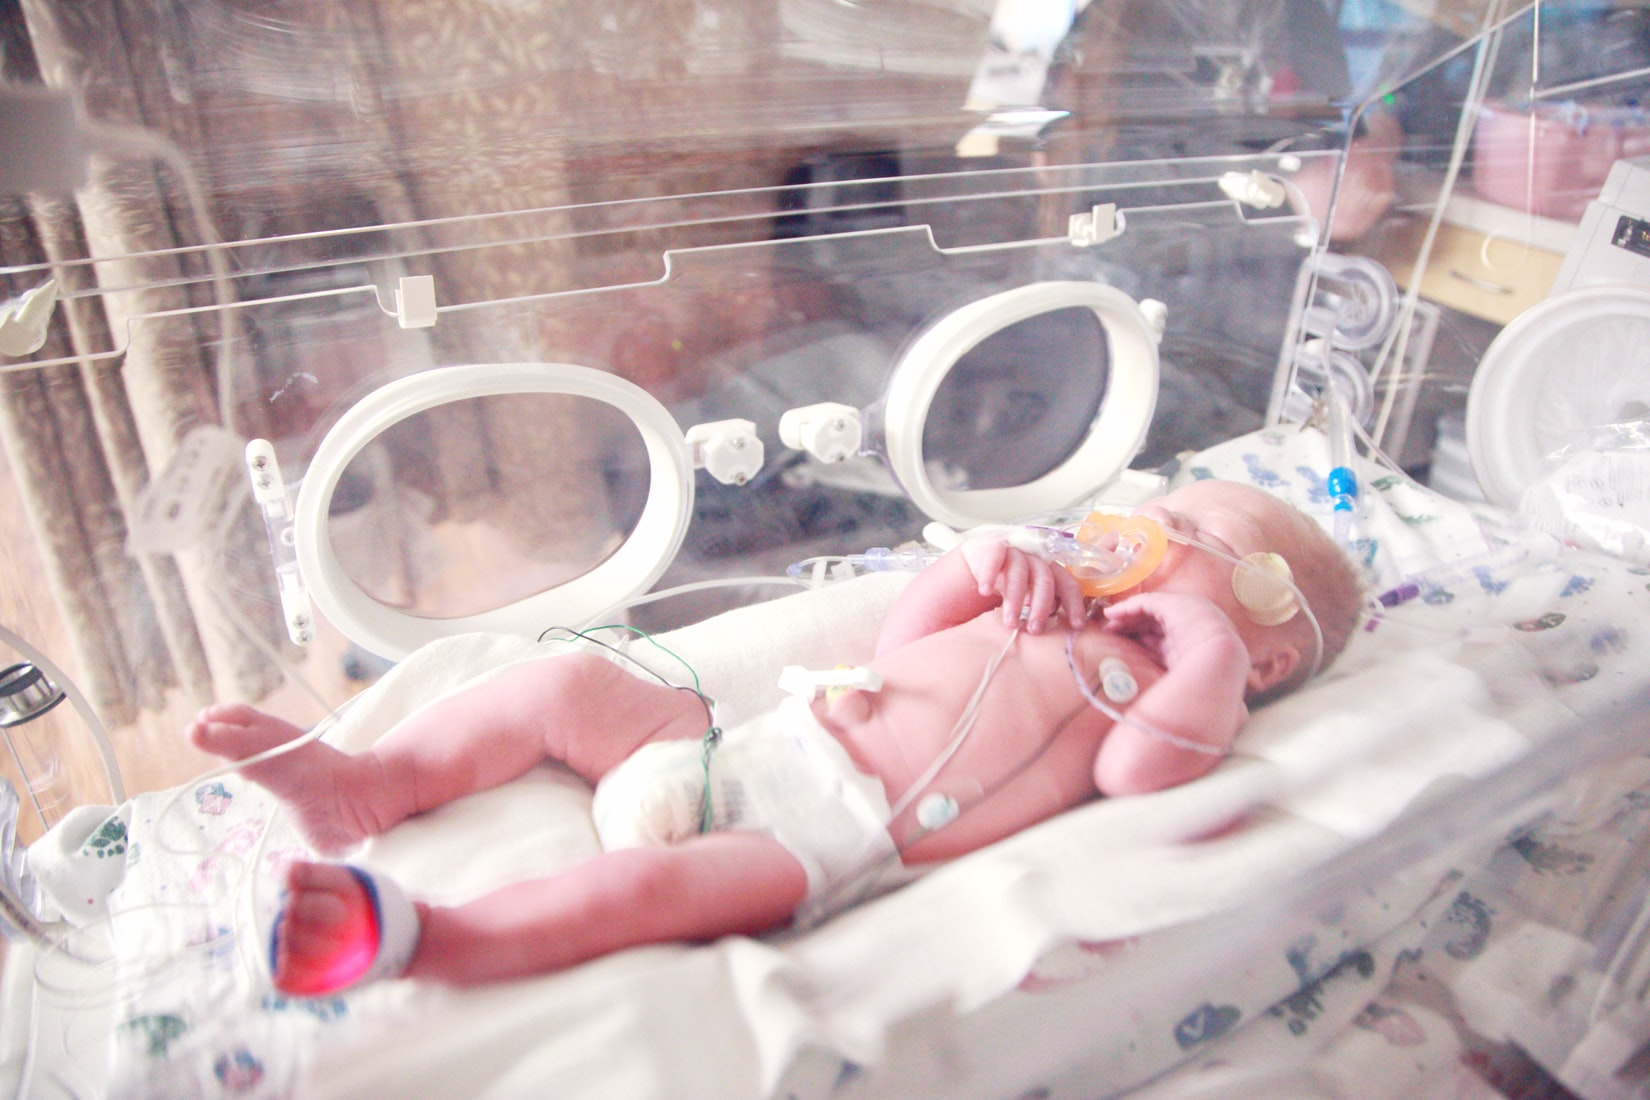 A newborn inside an incubator